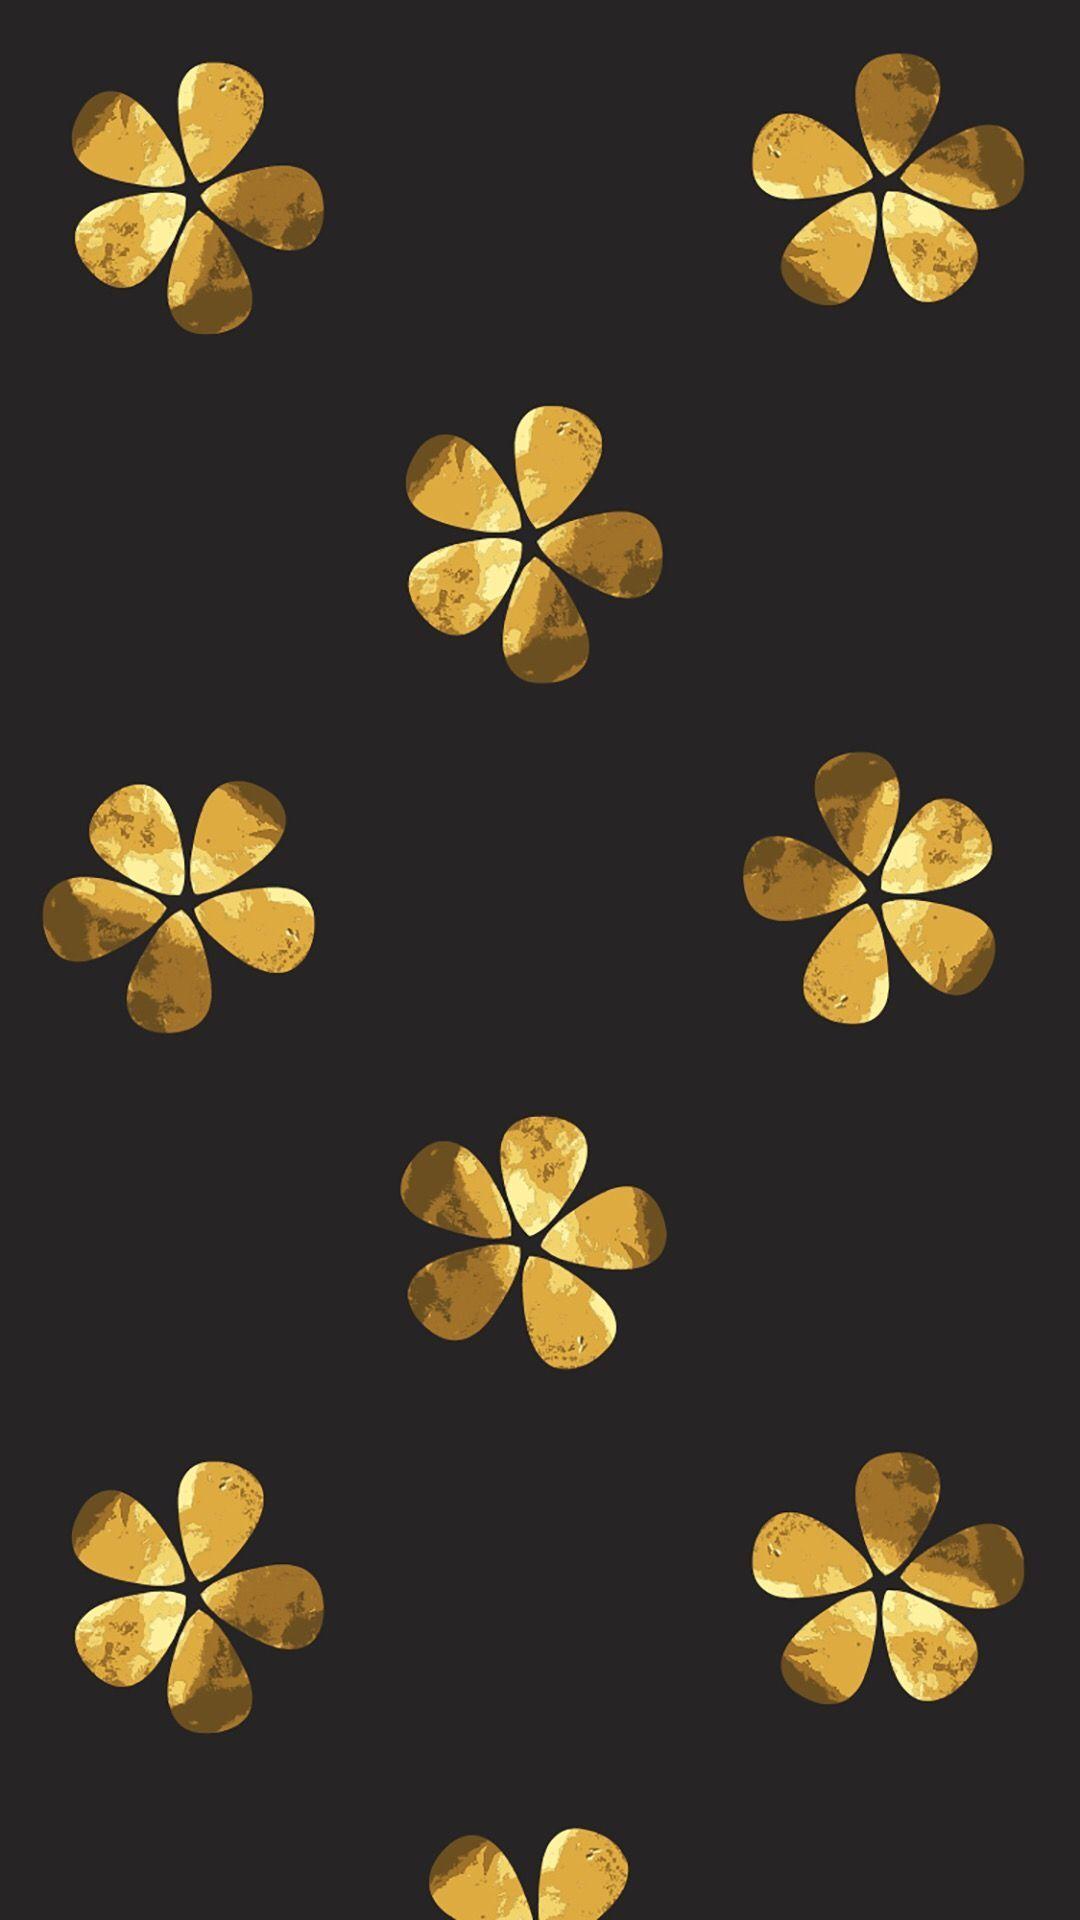 image result for yellow aesthetic wallpaper desktop